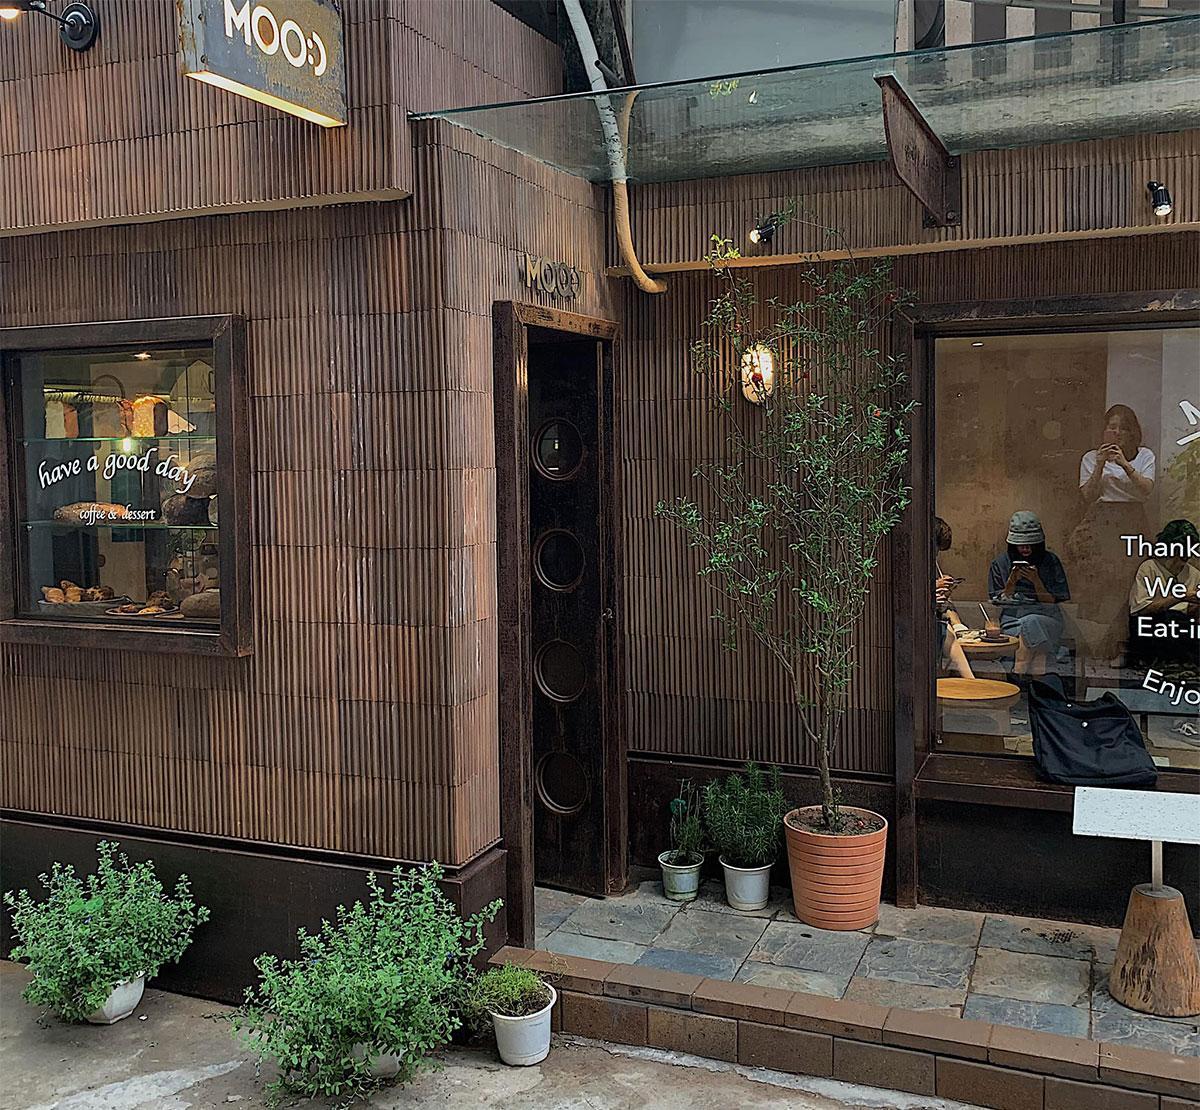 「MOO:D Kafe」の外観